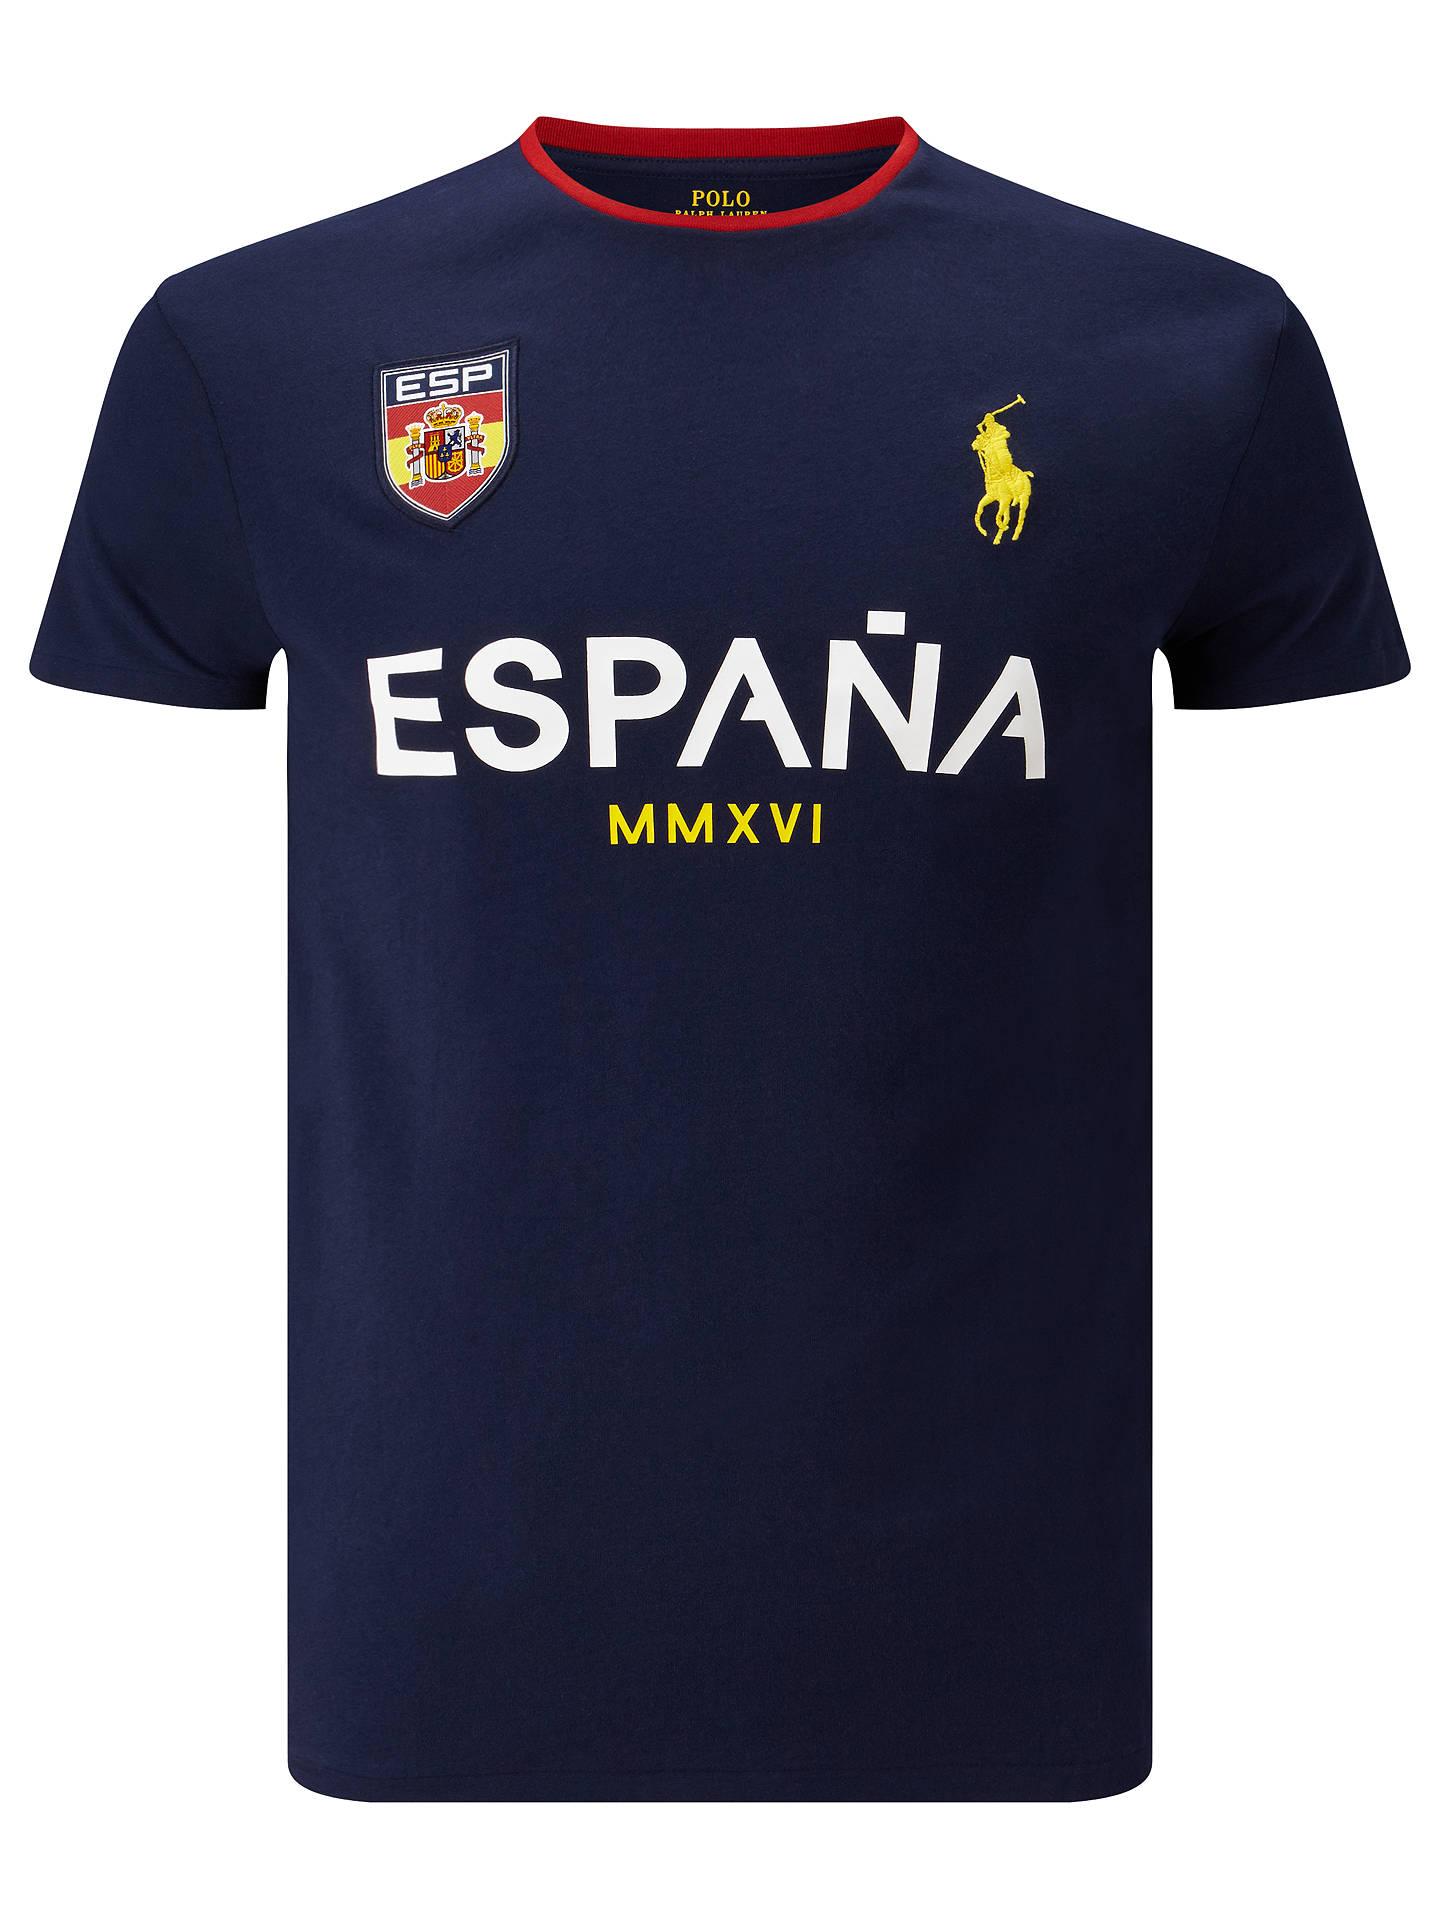 9f0e3cf1 Buy Polo Ralph Lauren Spain Short Sleeve Crew Neck T-Shirt, Cruise Navy, ...